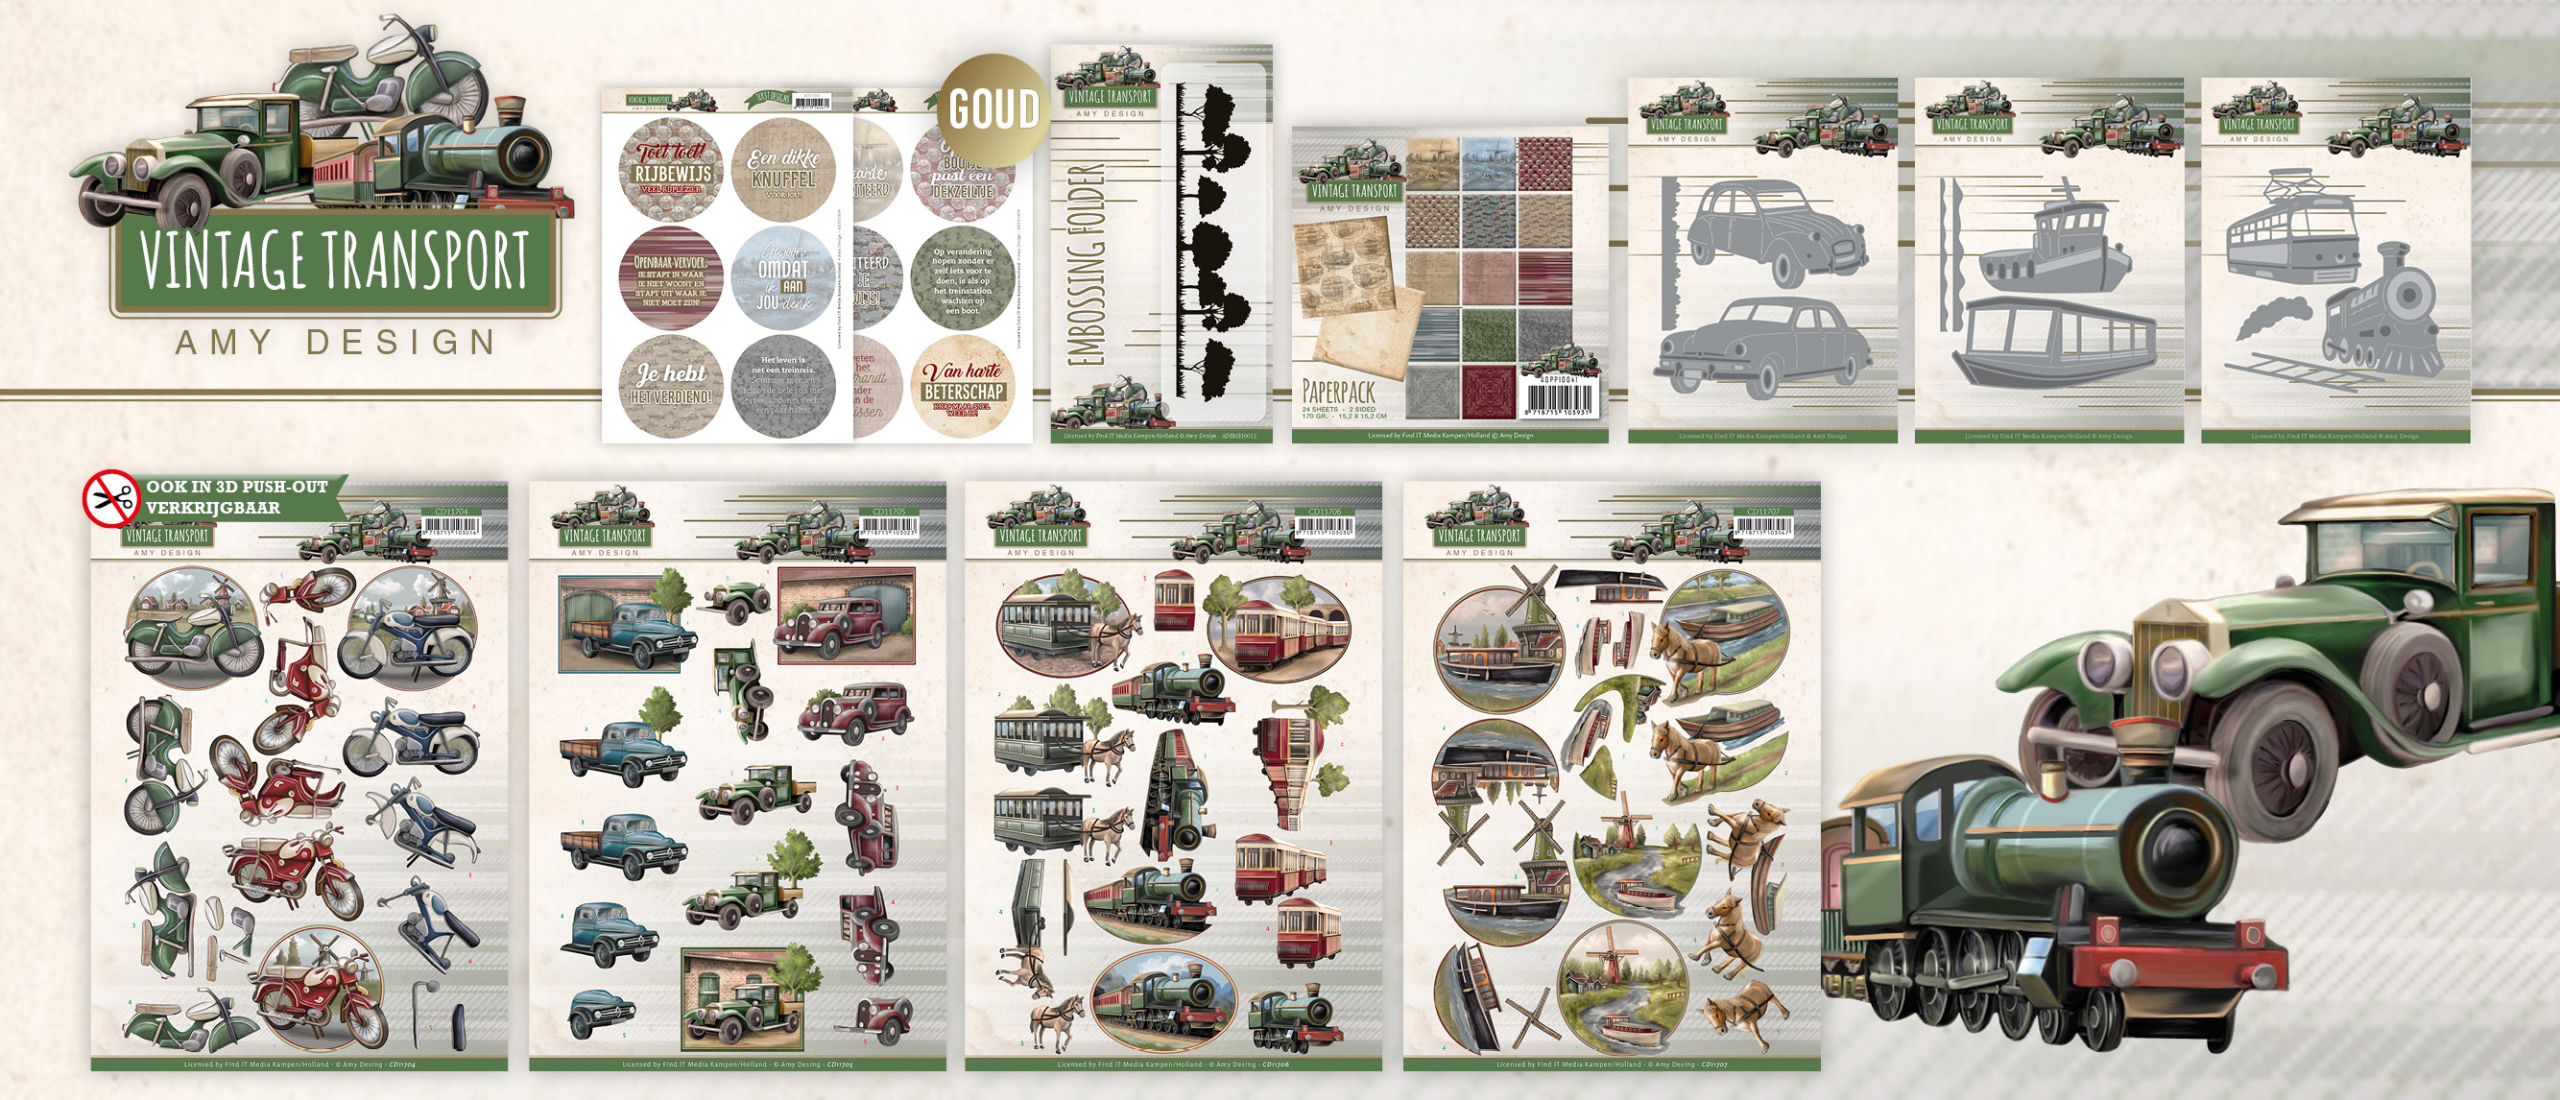 Collectie Vintage Transport - Amy Design